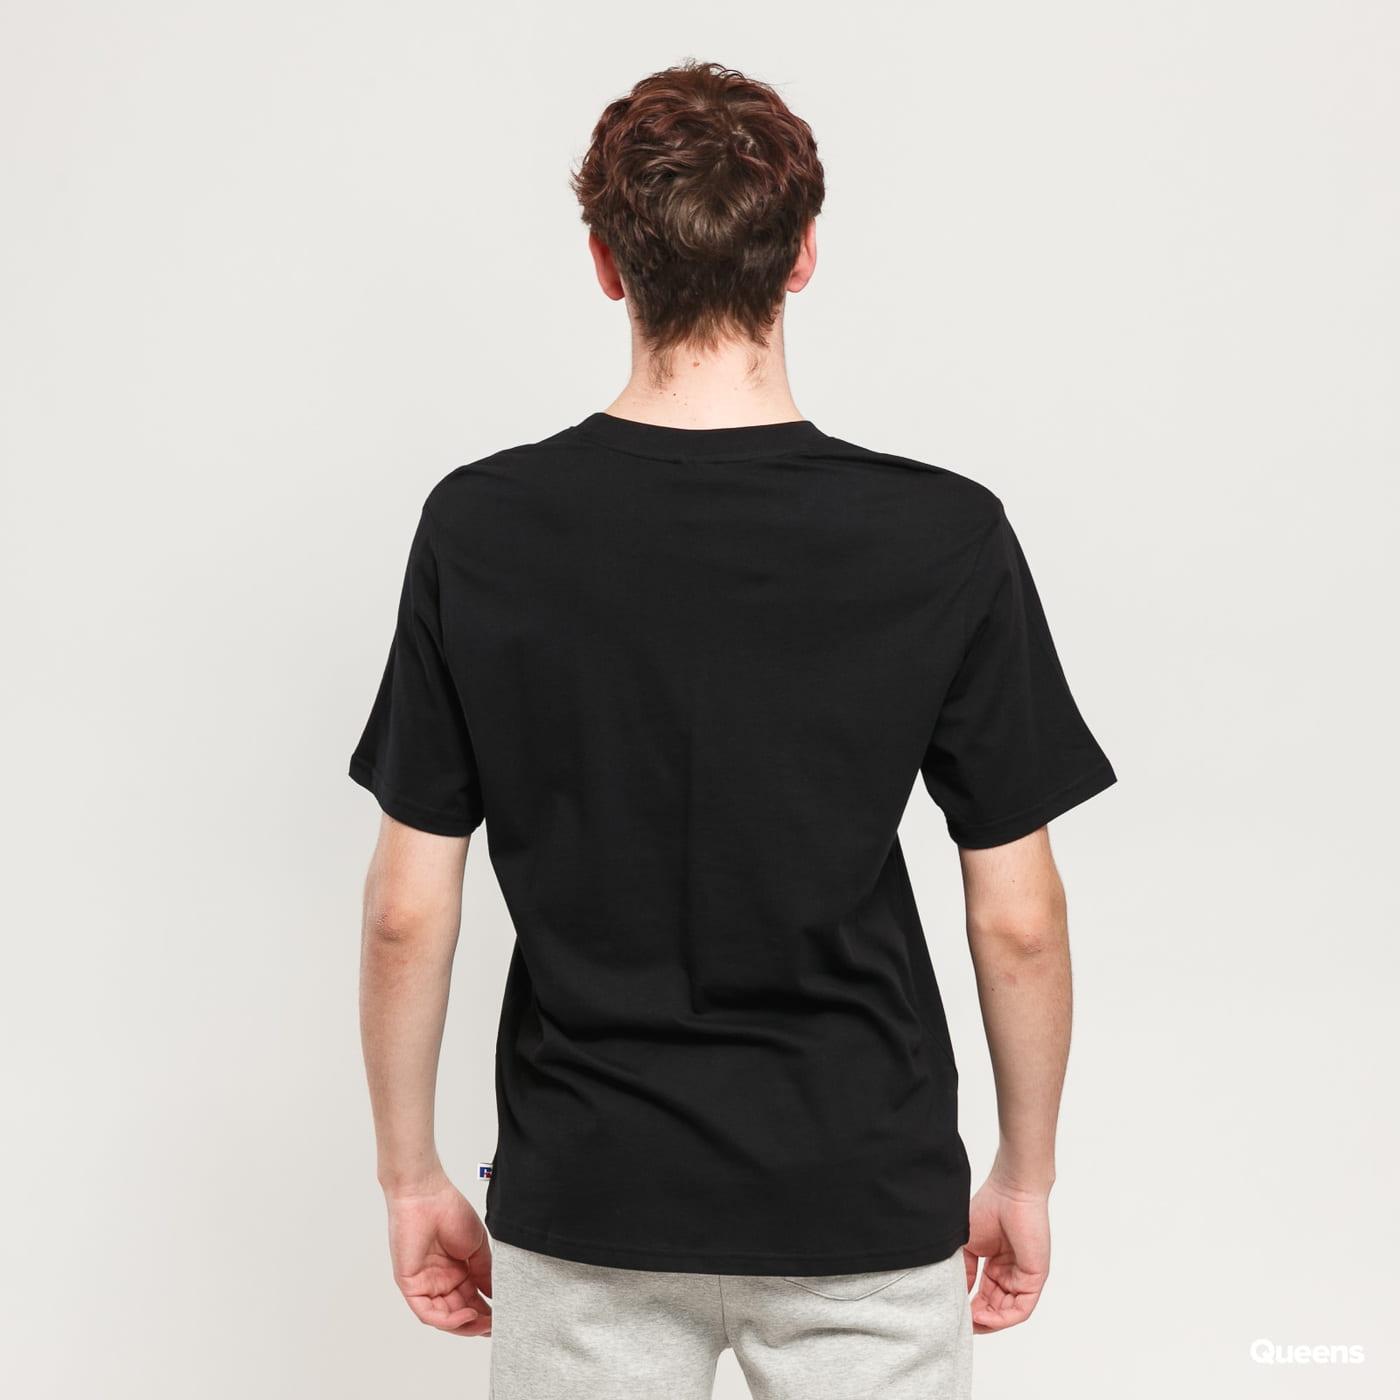 RUSSELL ATHLETIC Jerry T-Shirt černé